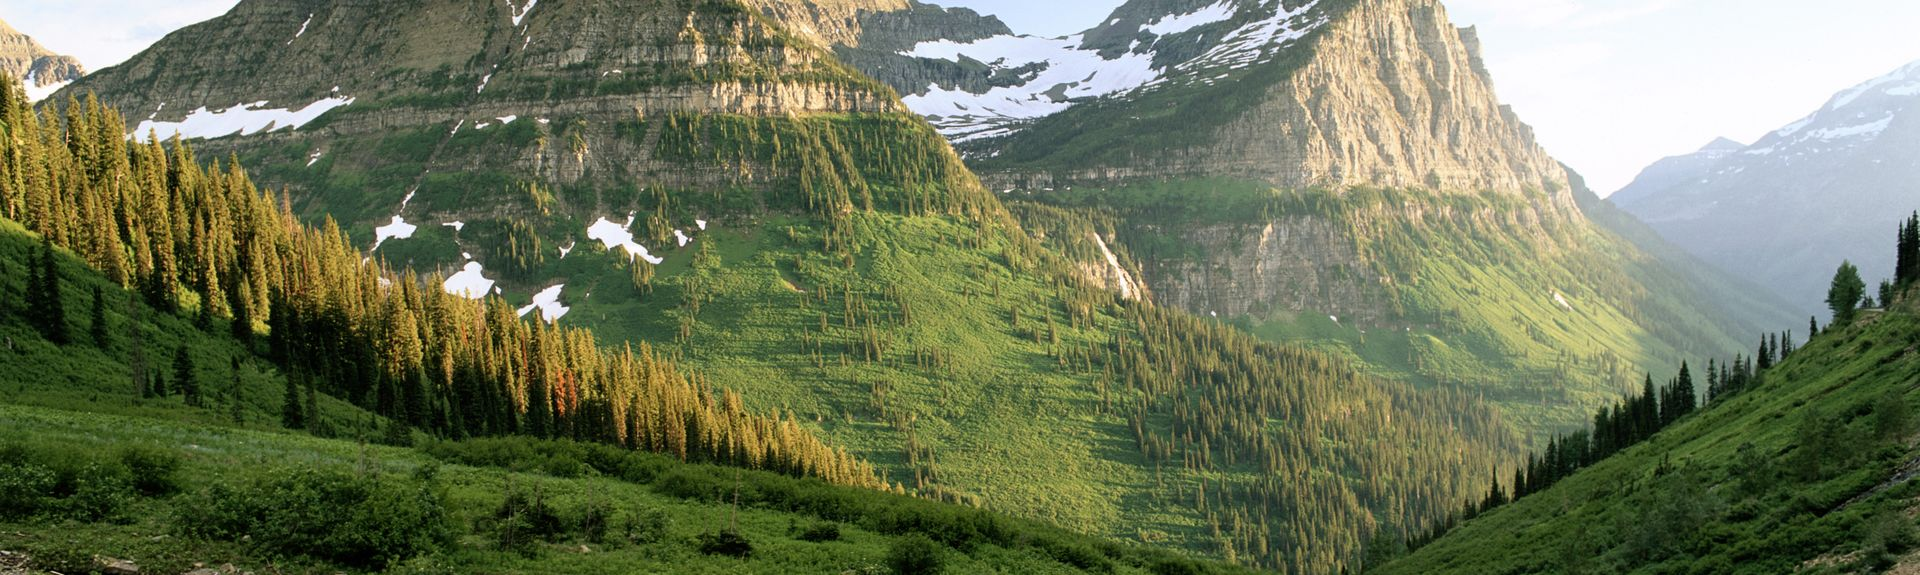 Montana, United States of America